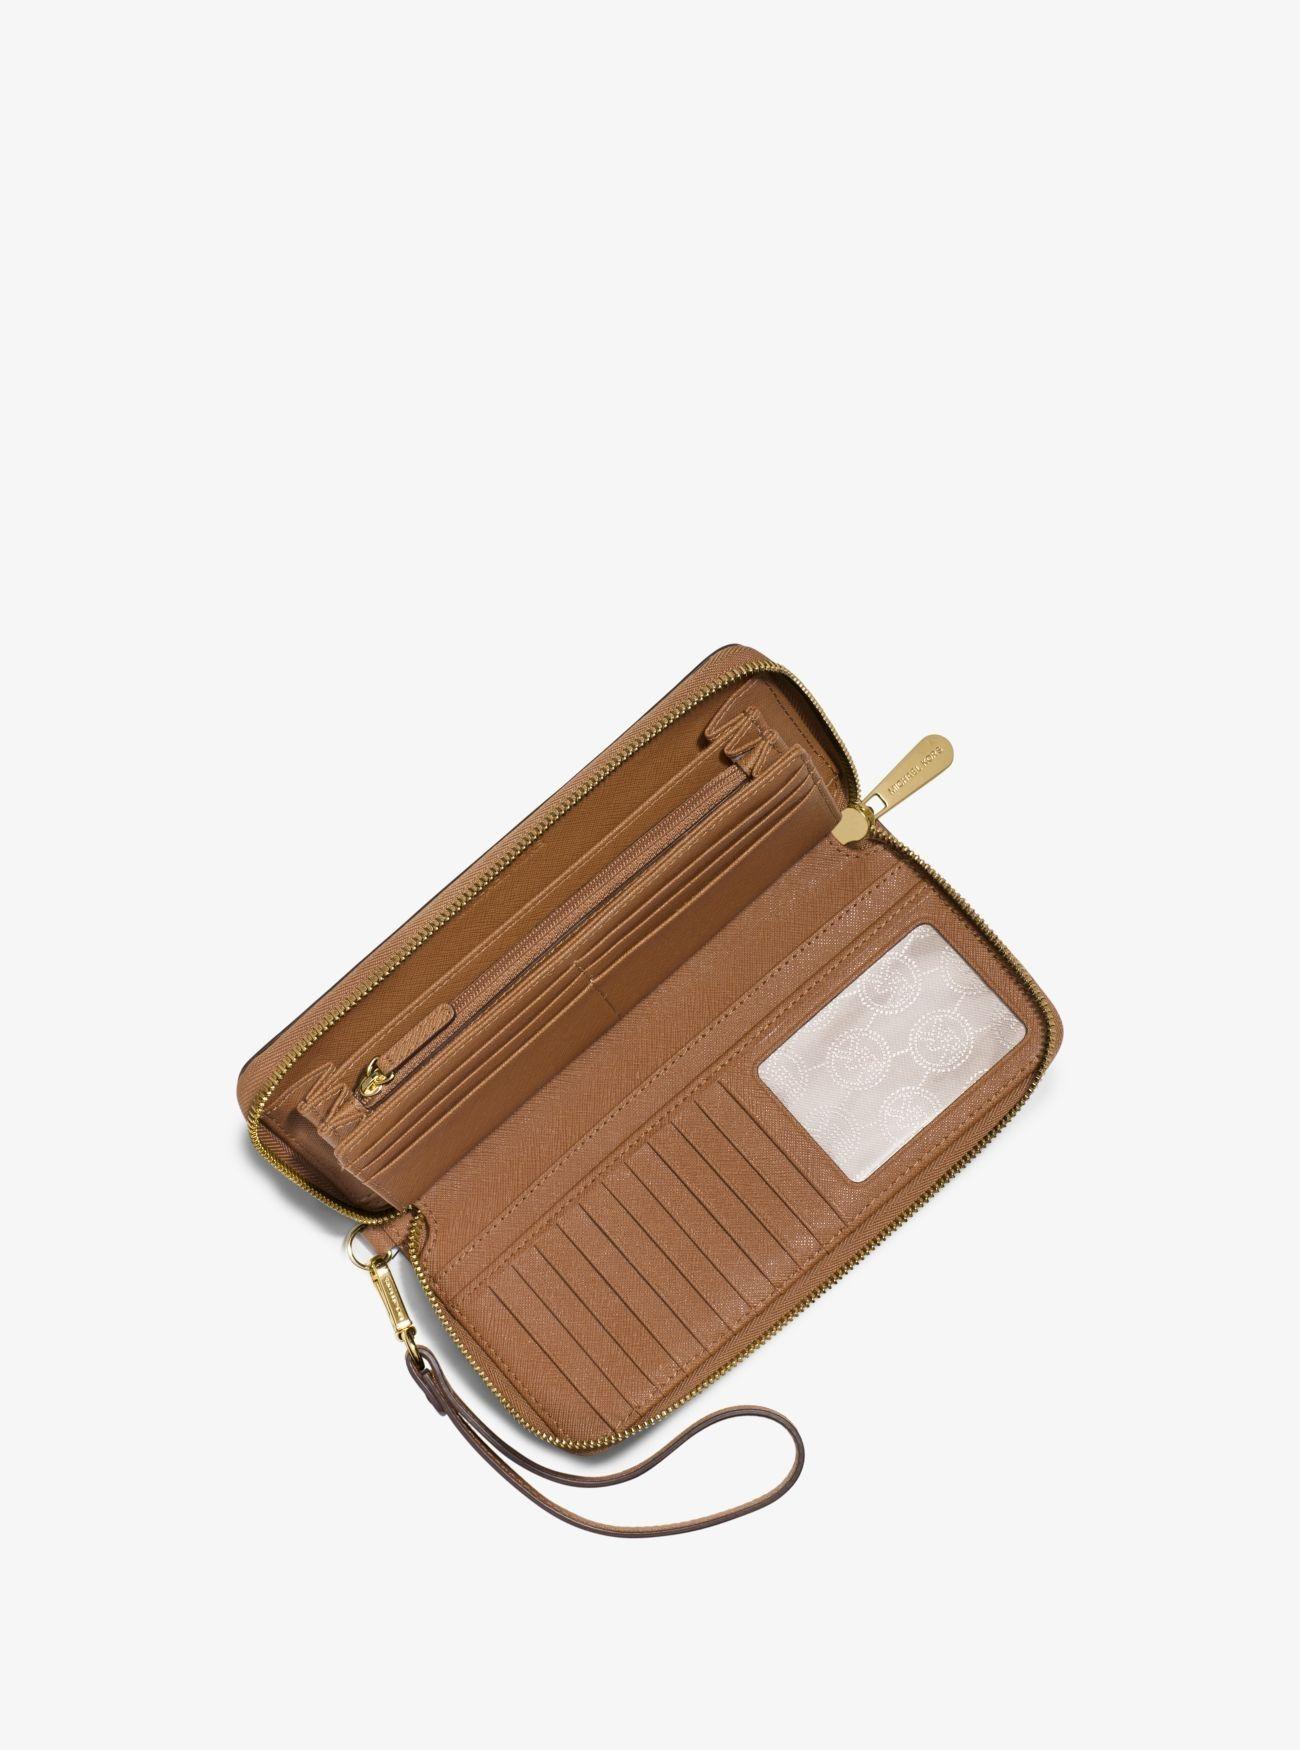 90a05305517f Online Michael Kors Acorn1 Jet Set Travel Leather Continental Wristlet Cheap